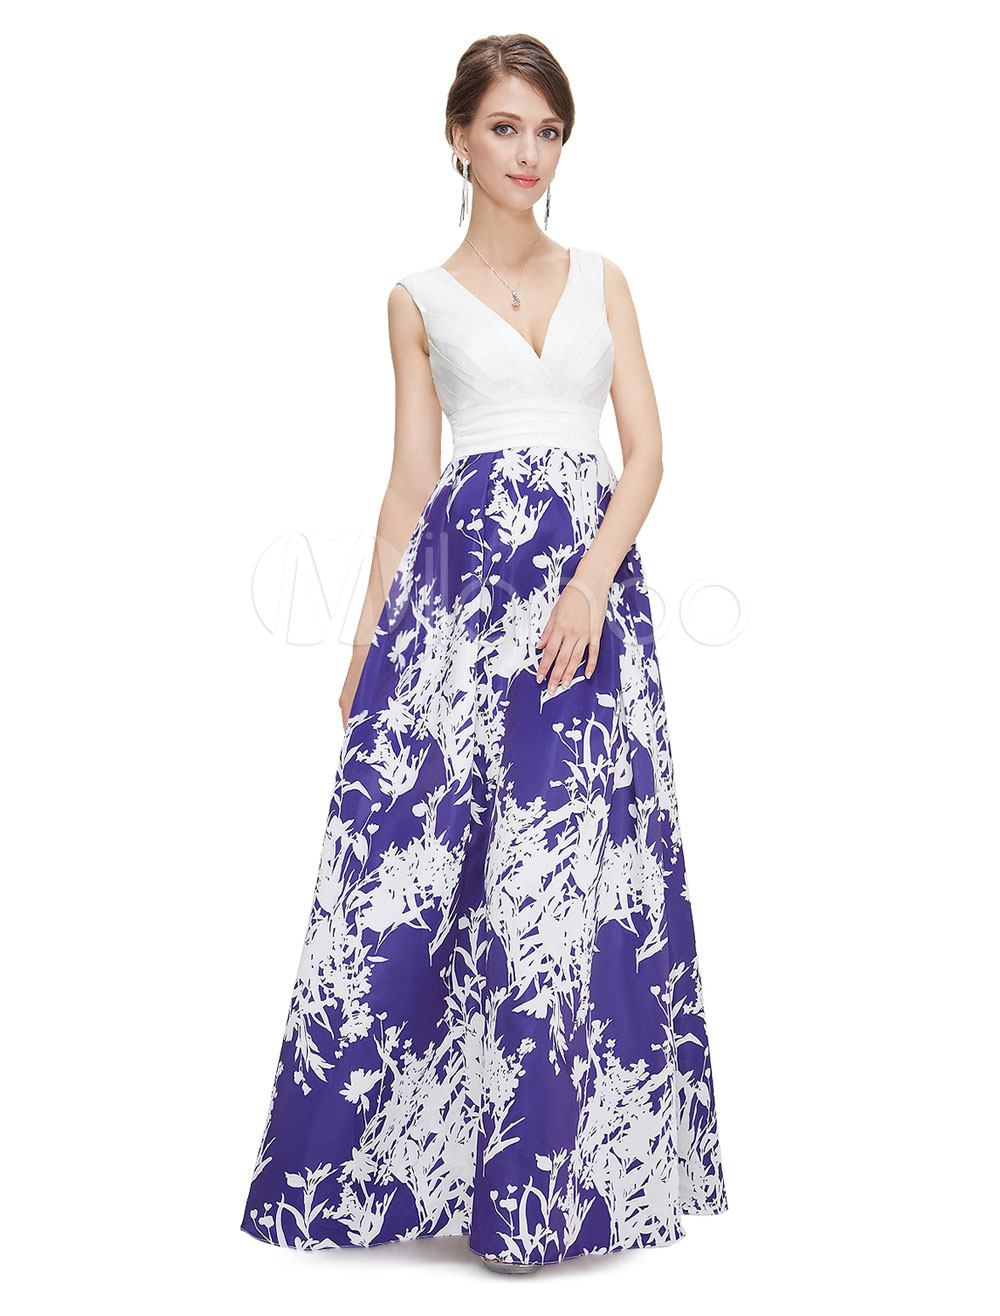 White Prom Dress Satin A Line Occasion Dress V Neck Sleeveless Printed Floor Length Party Dress (Wedding Prom Dresses) photo